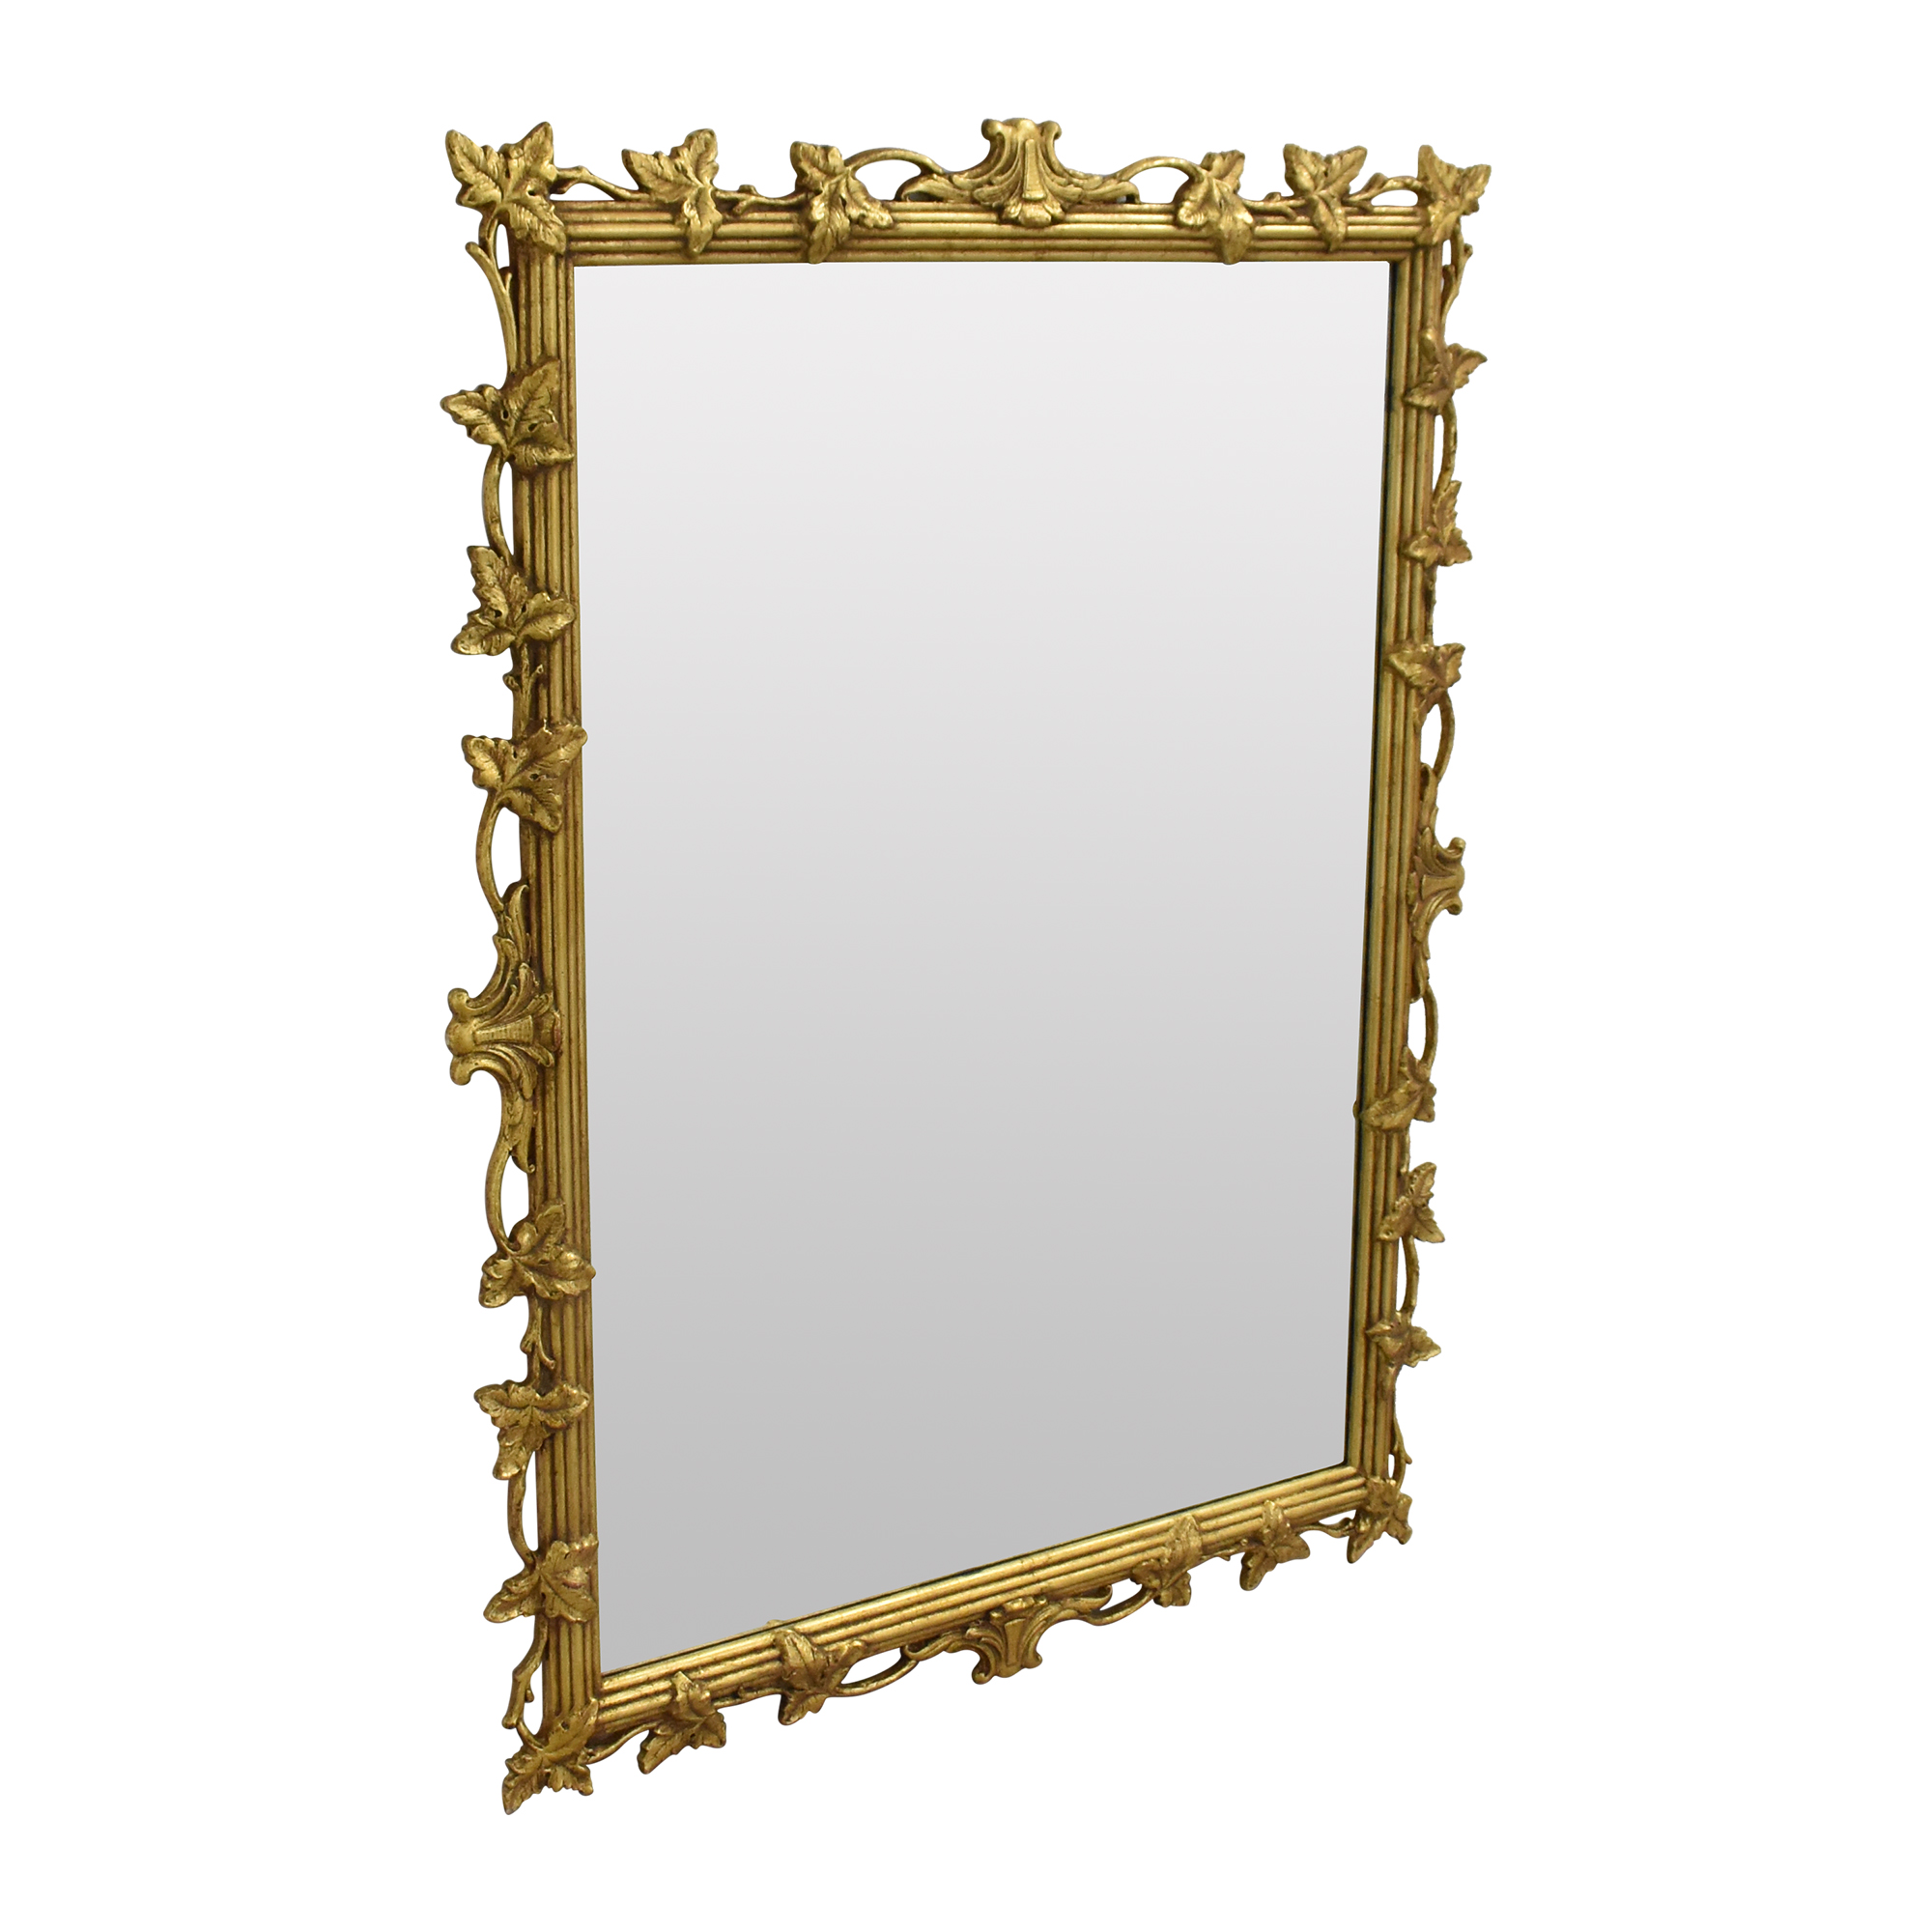 buy Friedman Brothers Friedman Brothers Decorative Arts Wall Mirror online